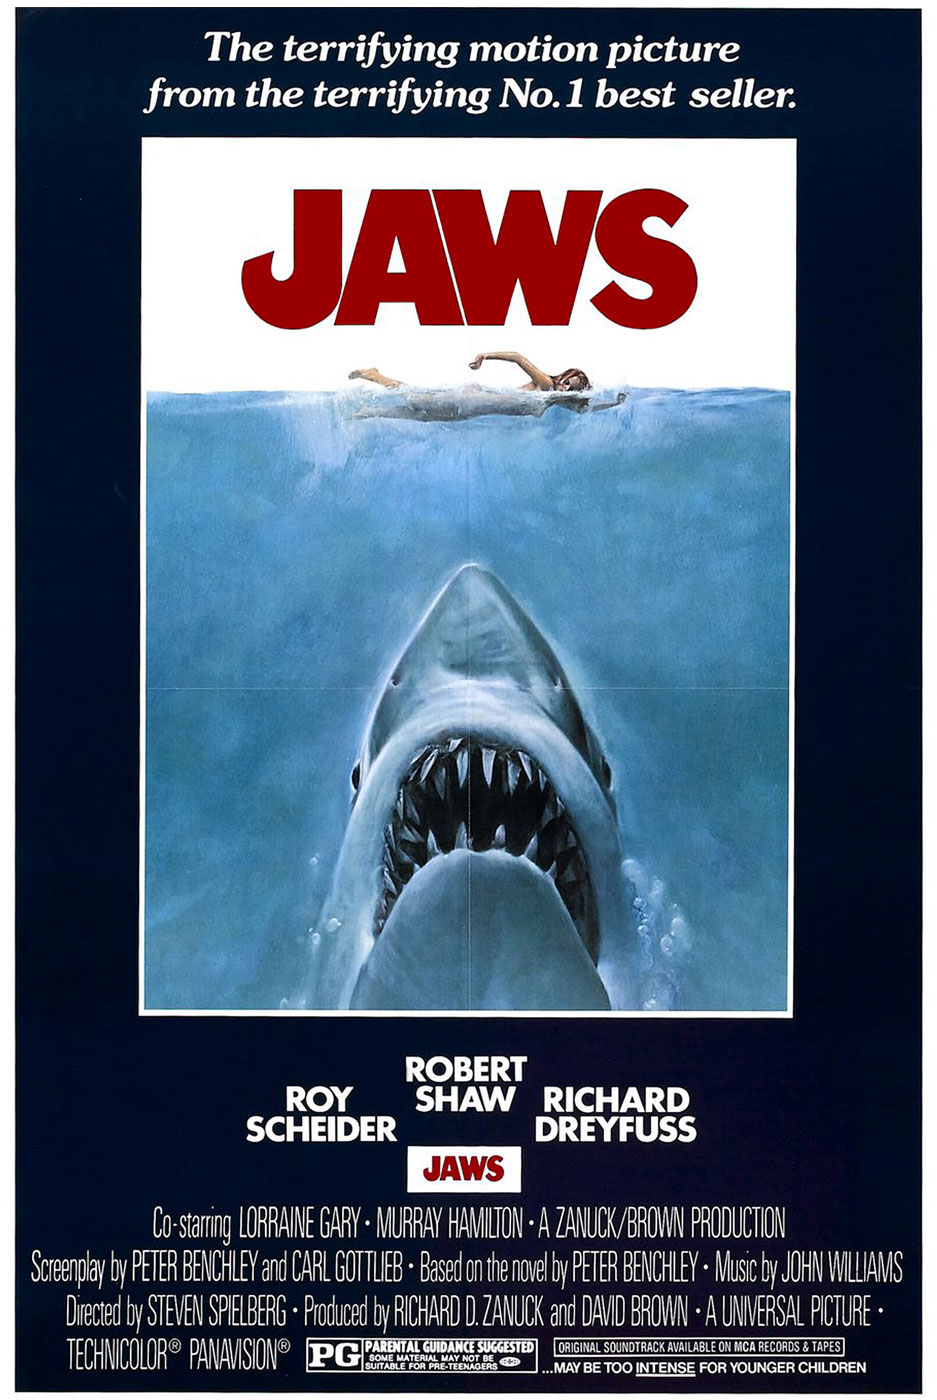 Película - Jaws - Steven Spielberg (1975)